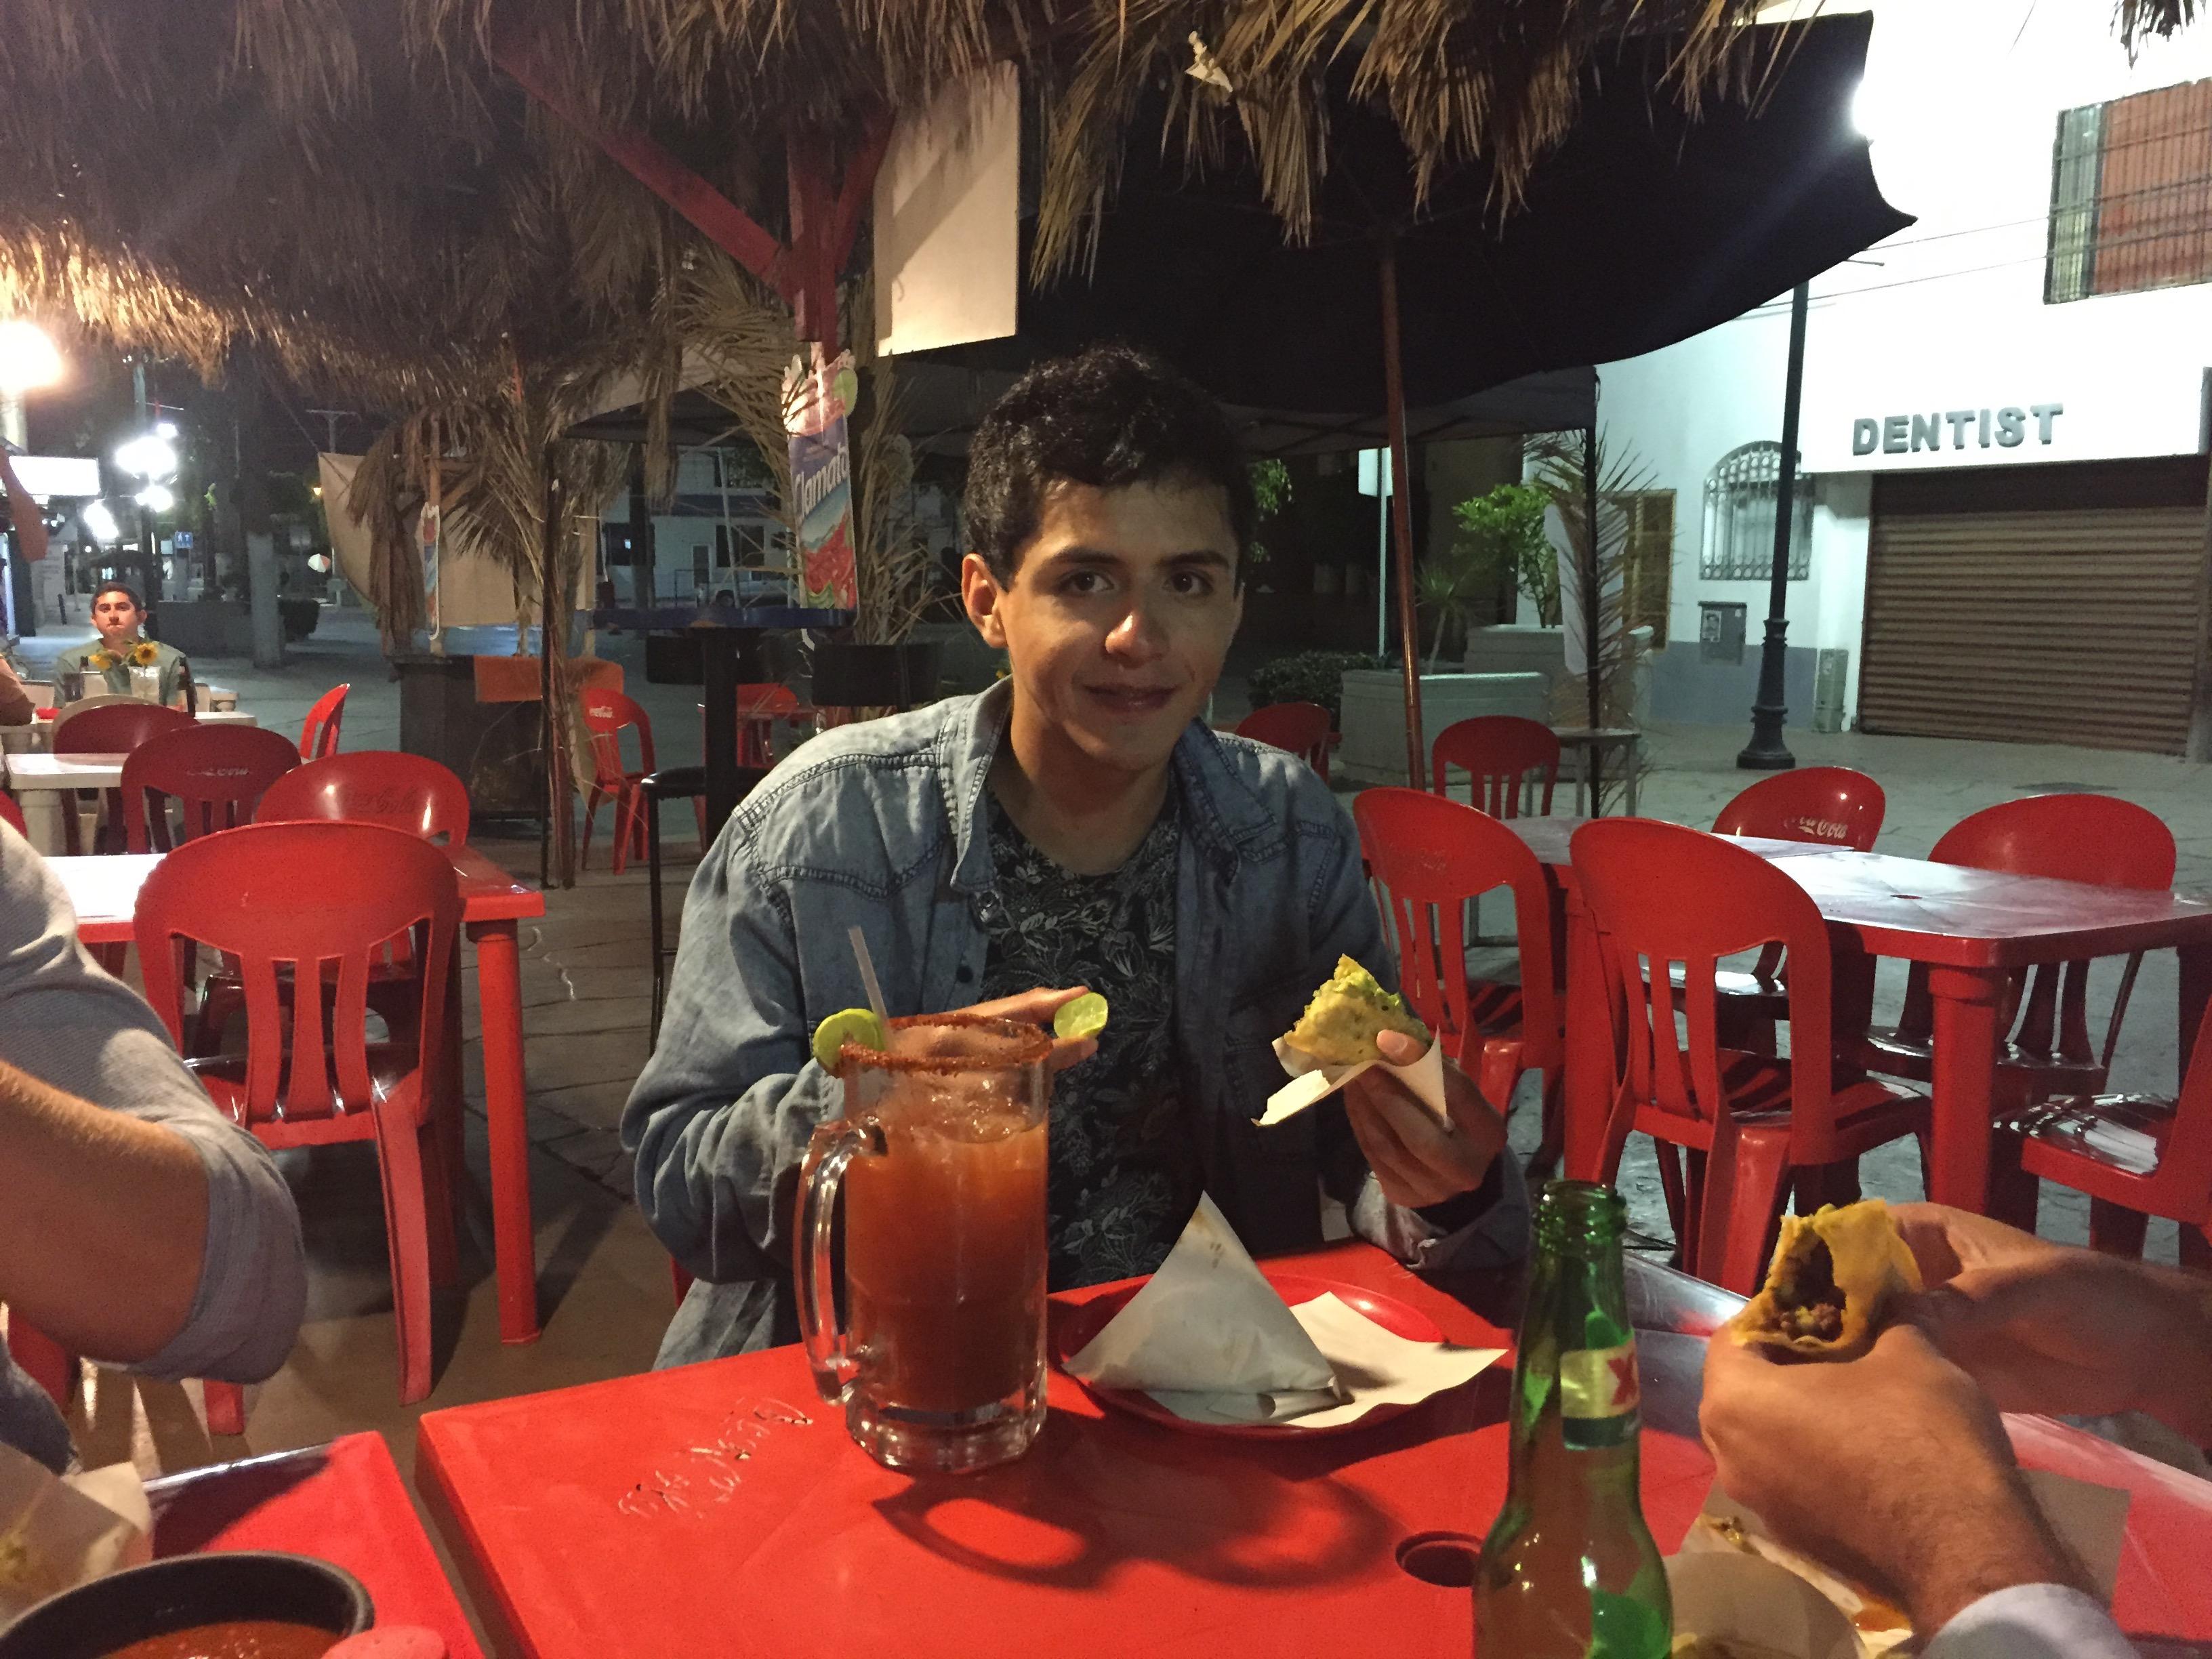 A Chilean eats tacos in Tijuana.